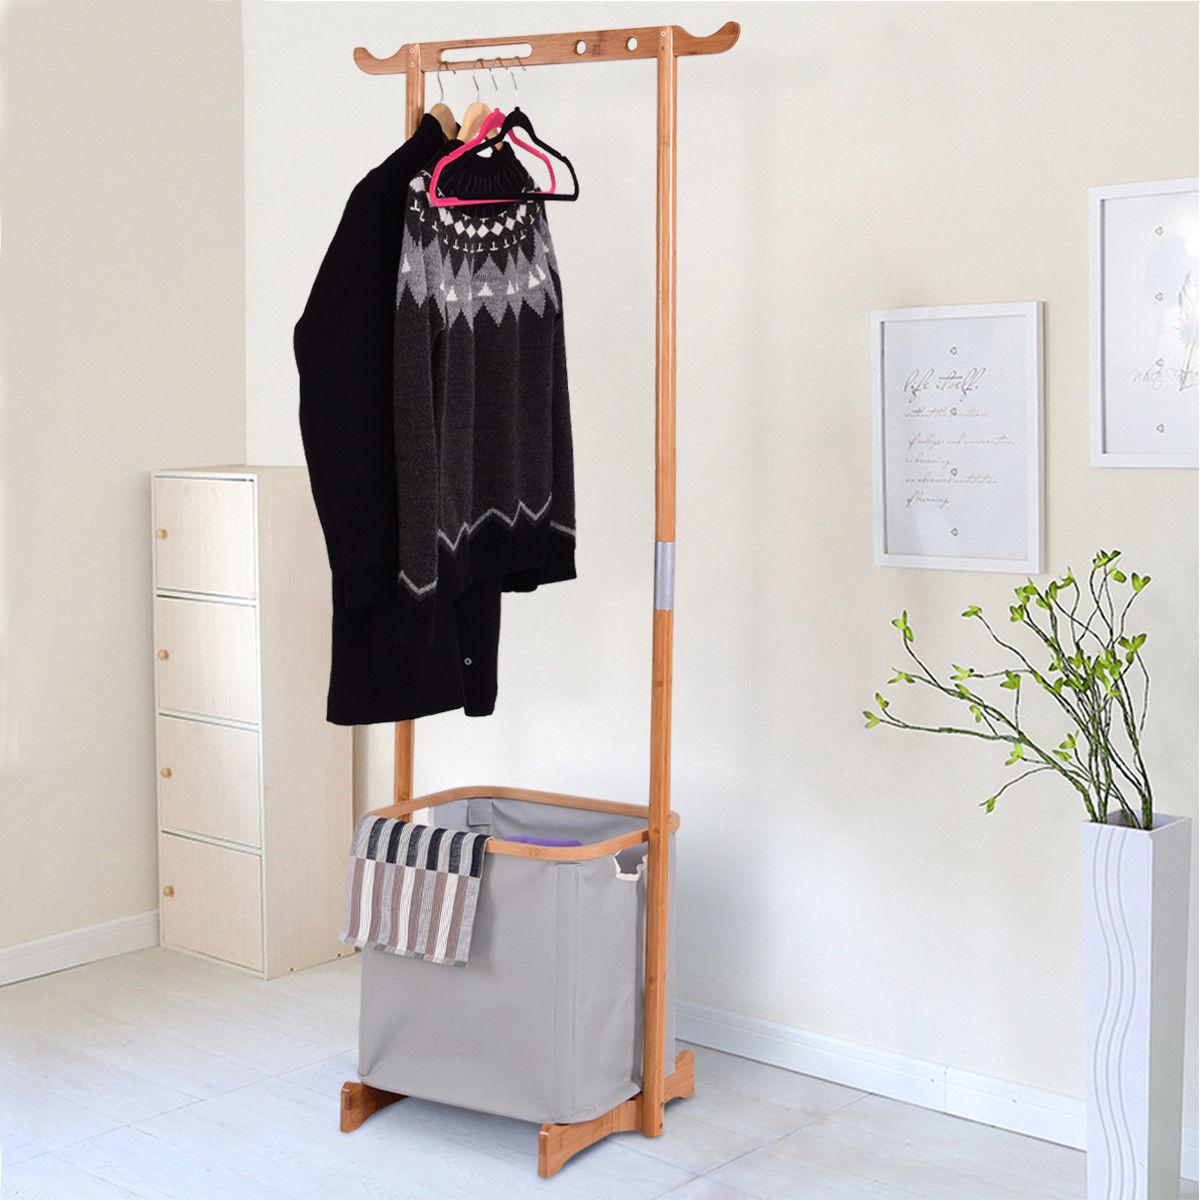 Giantex Bamboo Clothes Drying Rack Portable Laundry Hamper Garment Hanger Storage Clothing Organizer HW56584